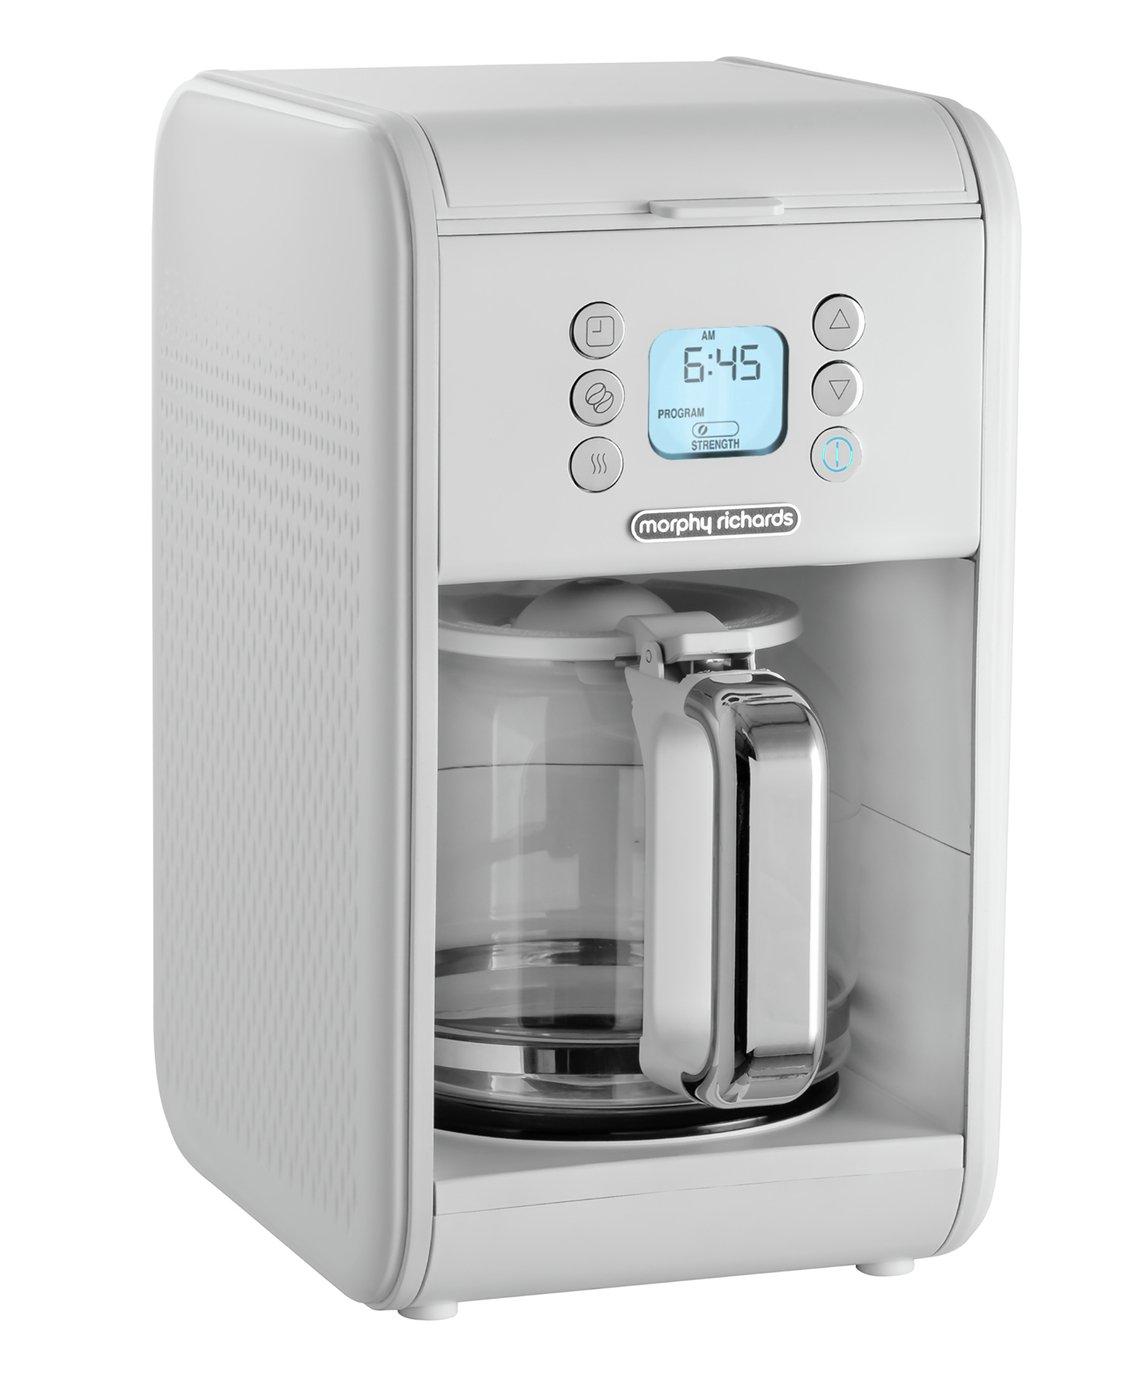 Morphy Richards 163007 Verve Filter Coffee Machine - White